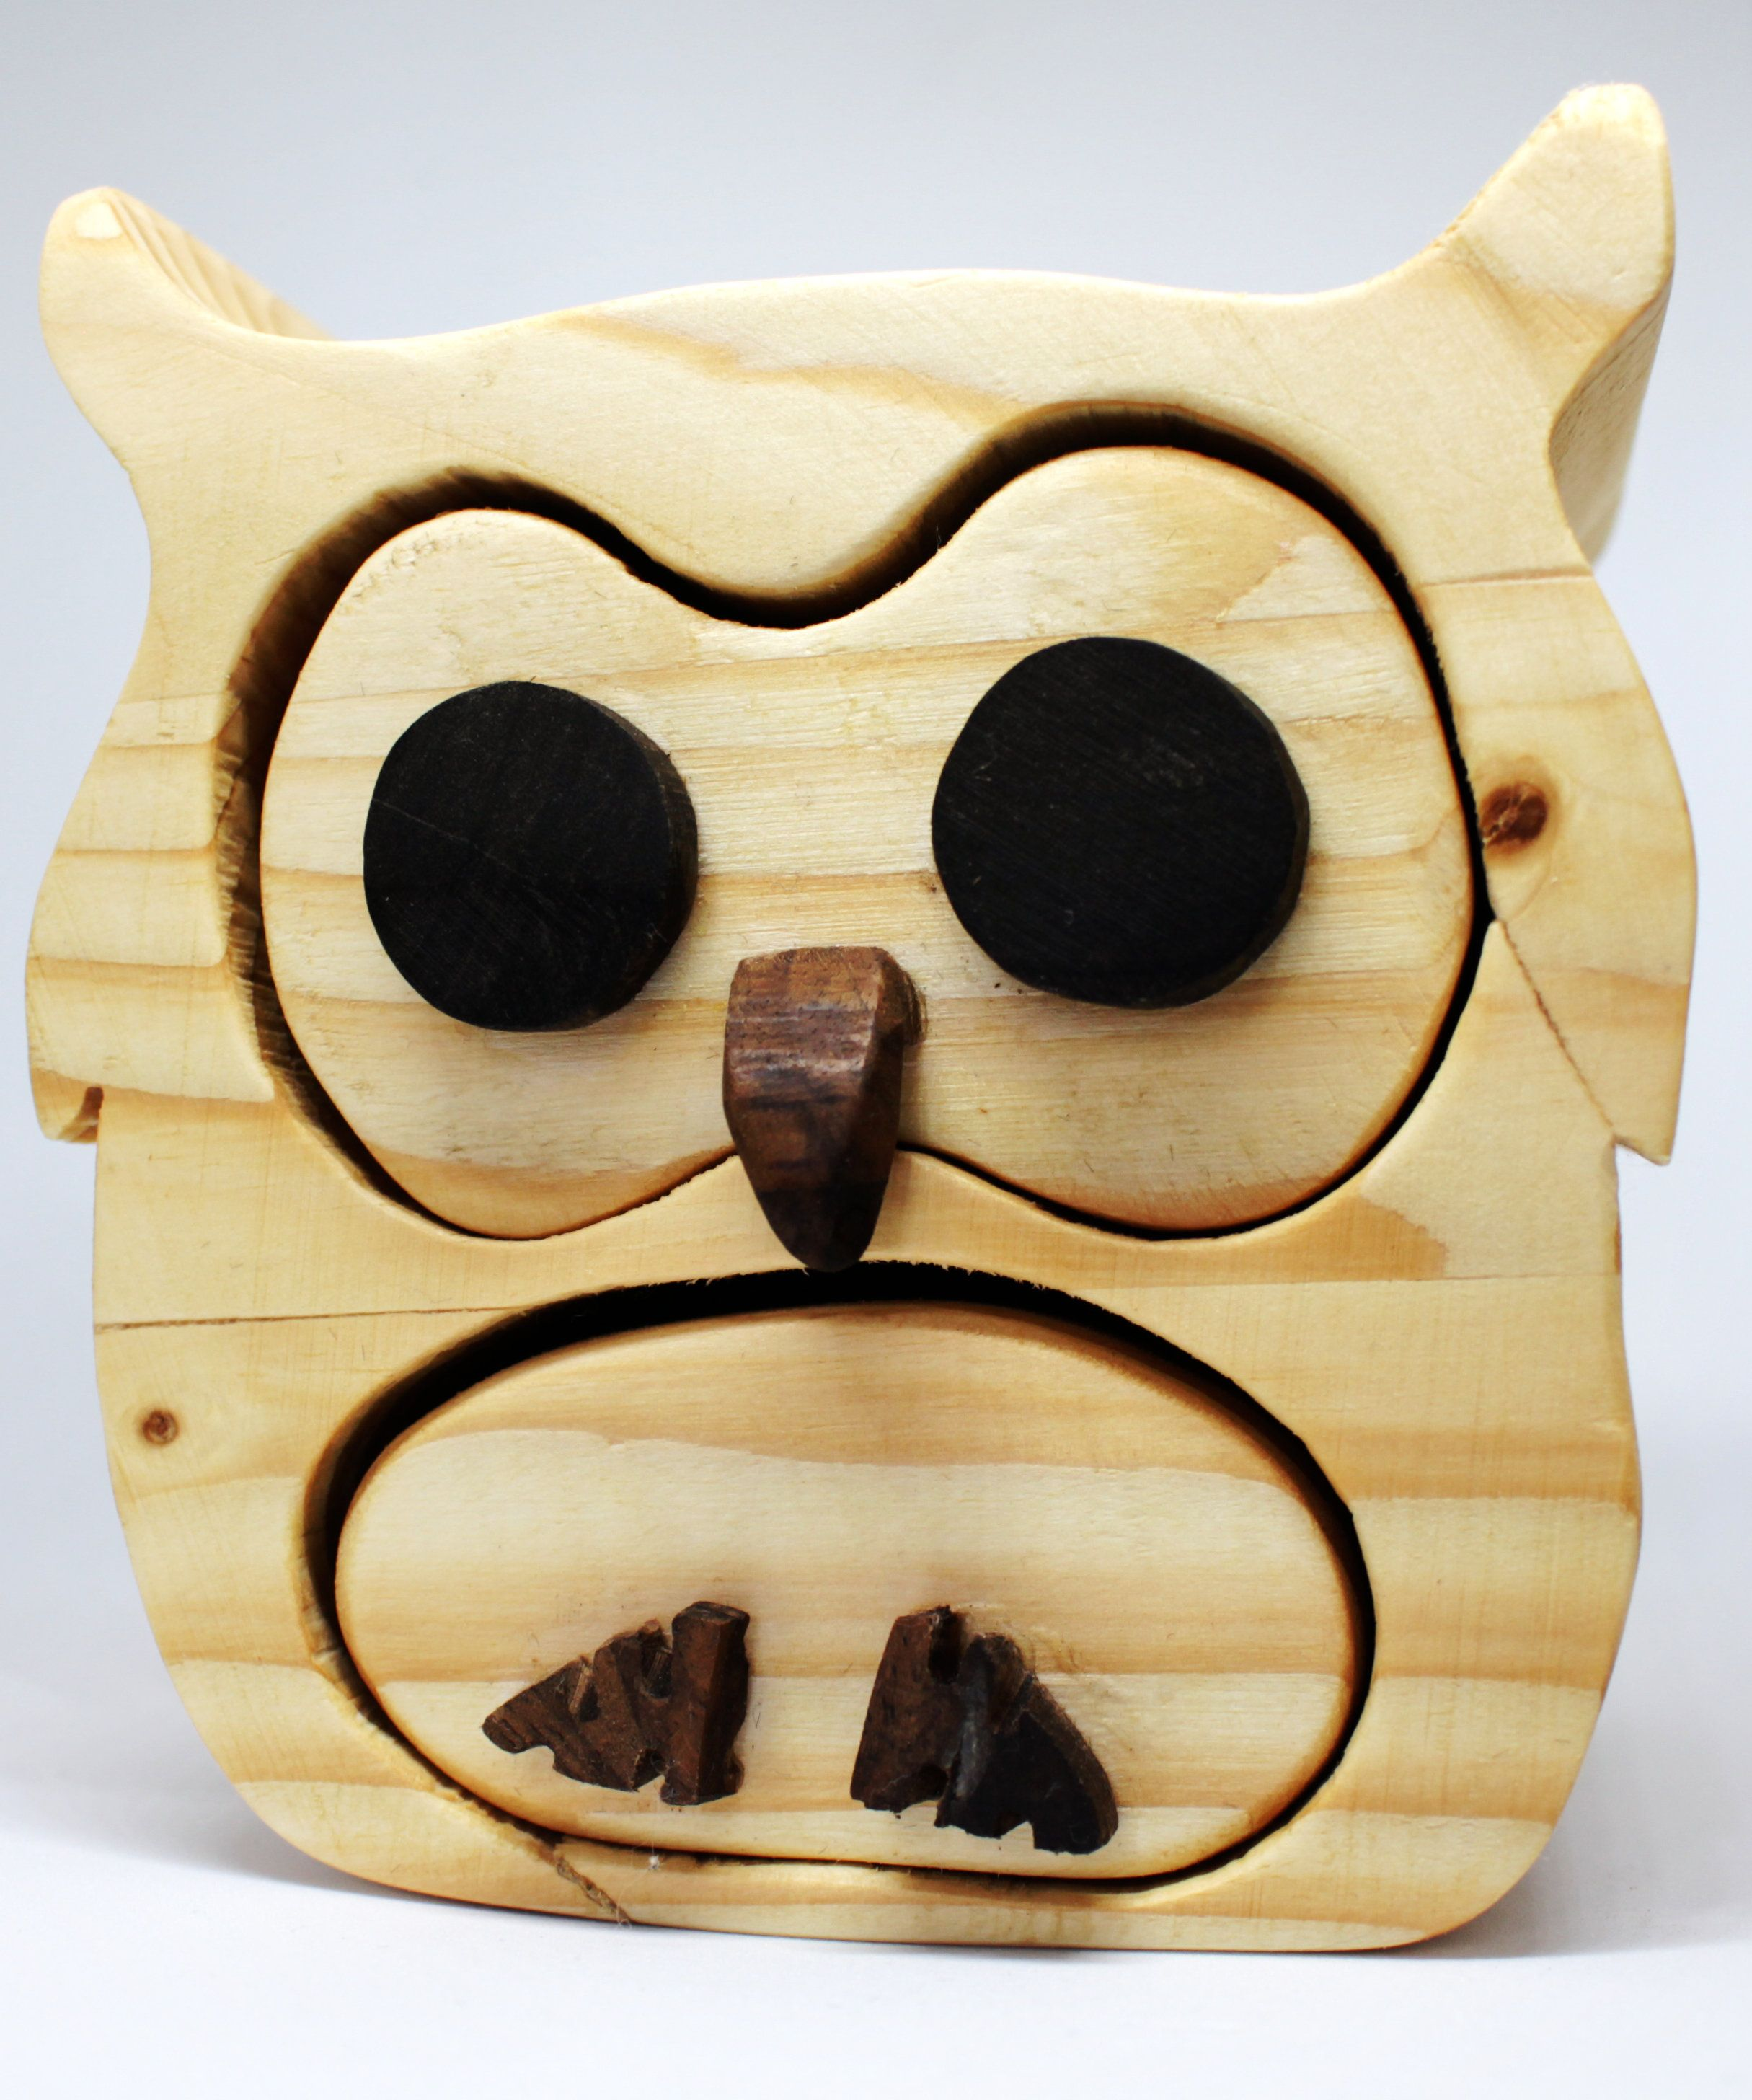 Unique gift for bird lovers Trinket Box Pine Bandsaw Box Wooden Jewellery Box Owl Hand made  Keepsake Birthday or anniversary present.